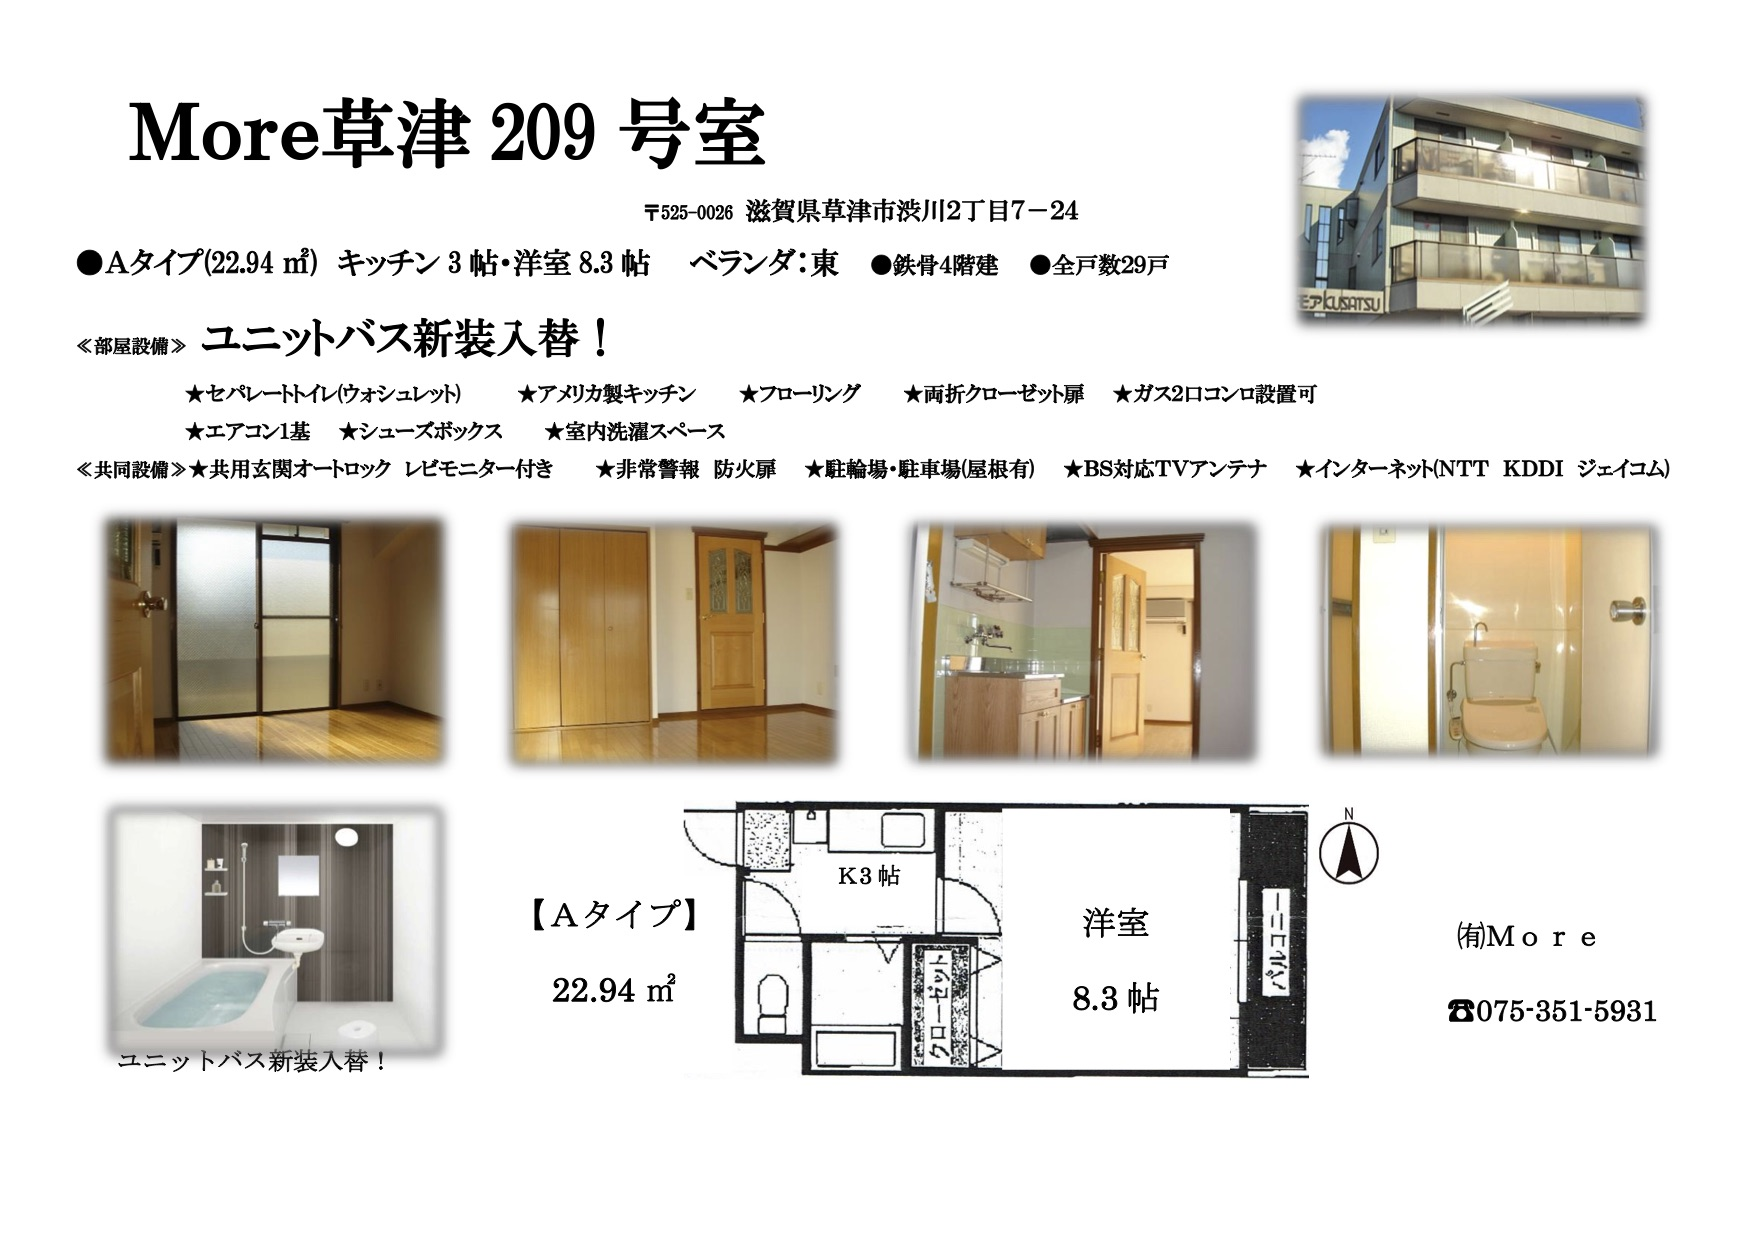 More草津209概要